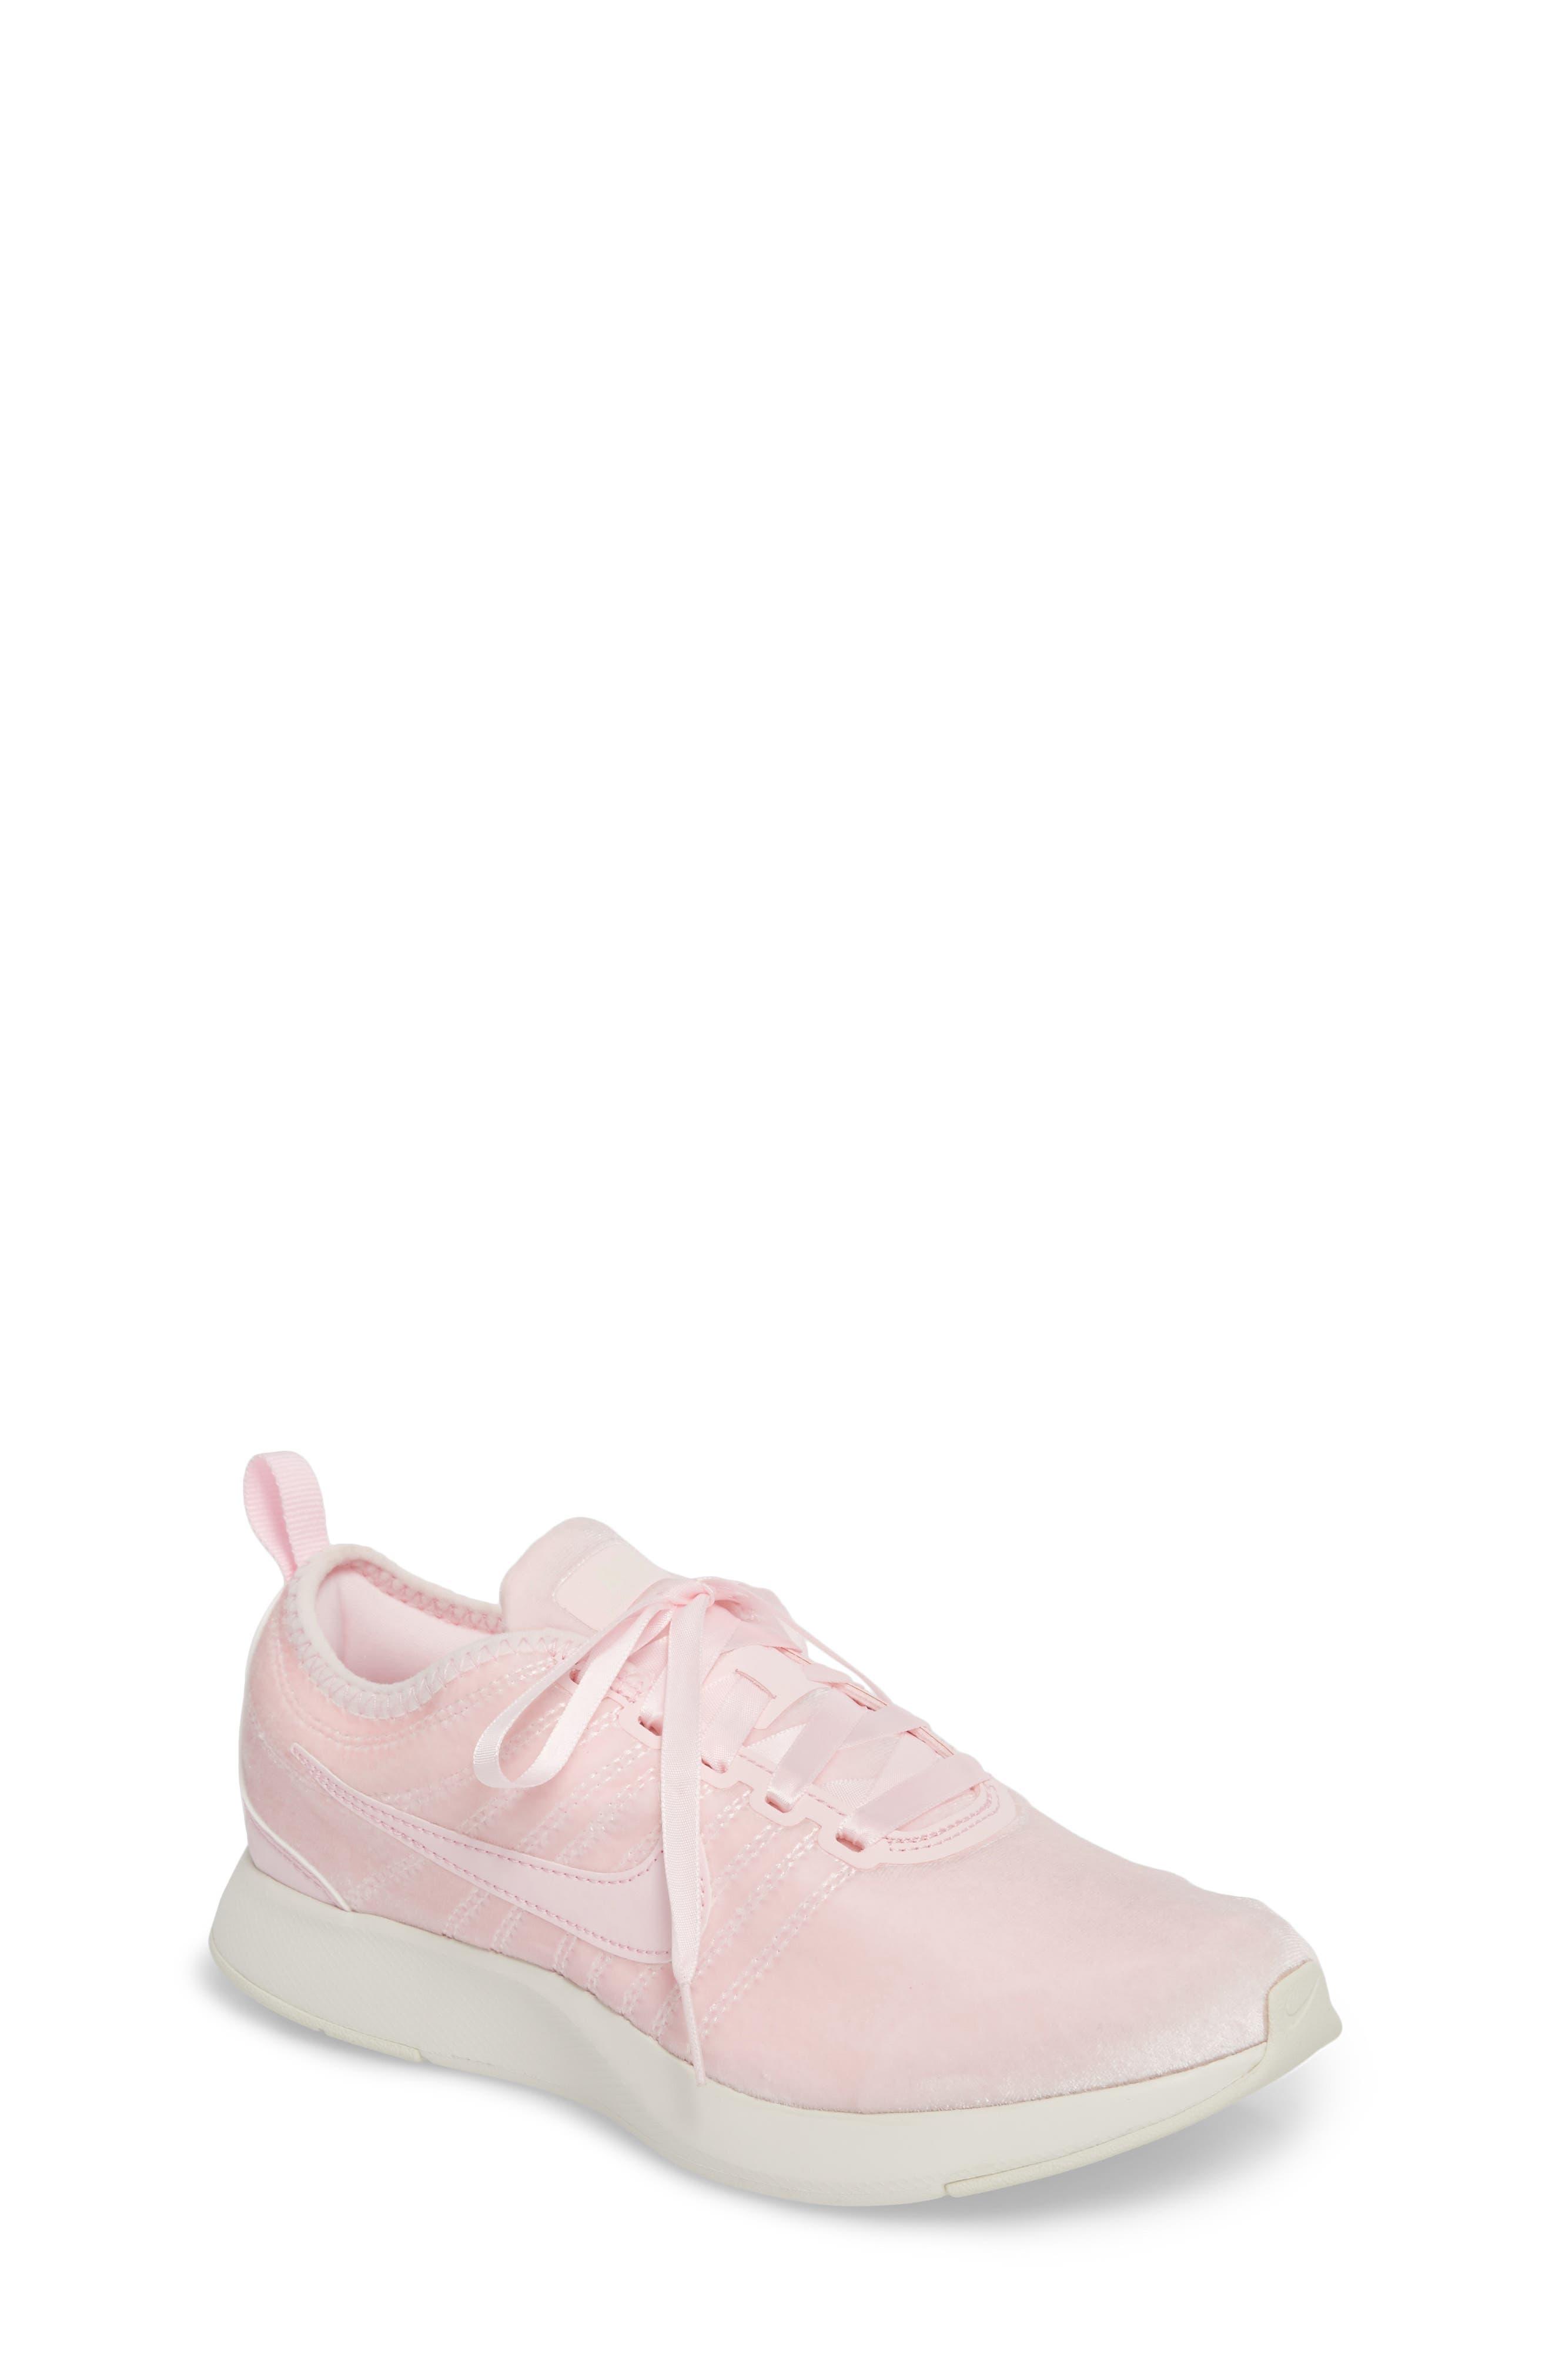 Dualtone Racer SE Sneaker,                             Main thumbnail 1, color,                             650